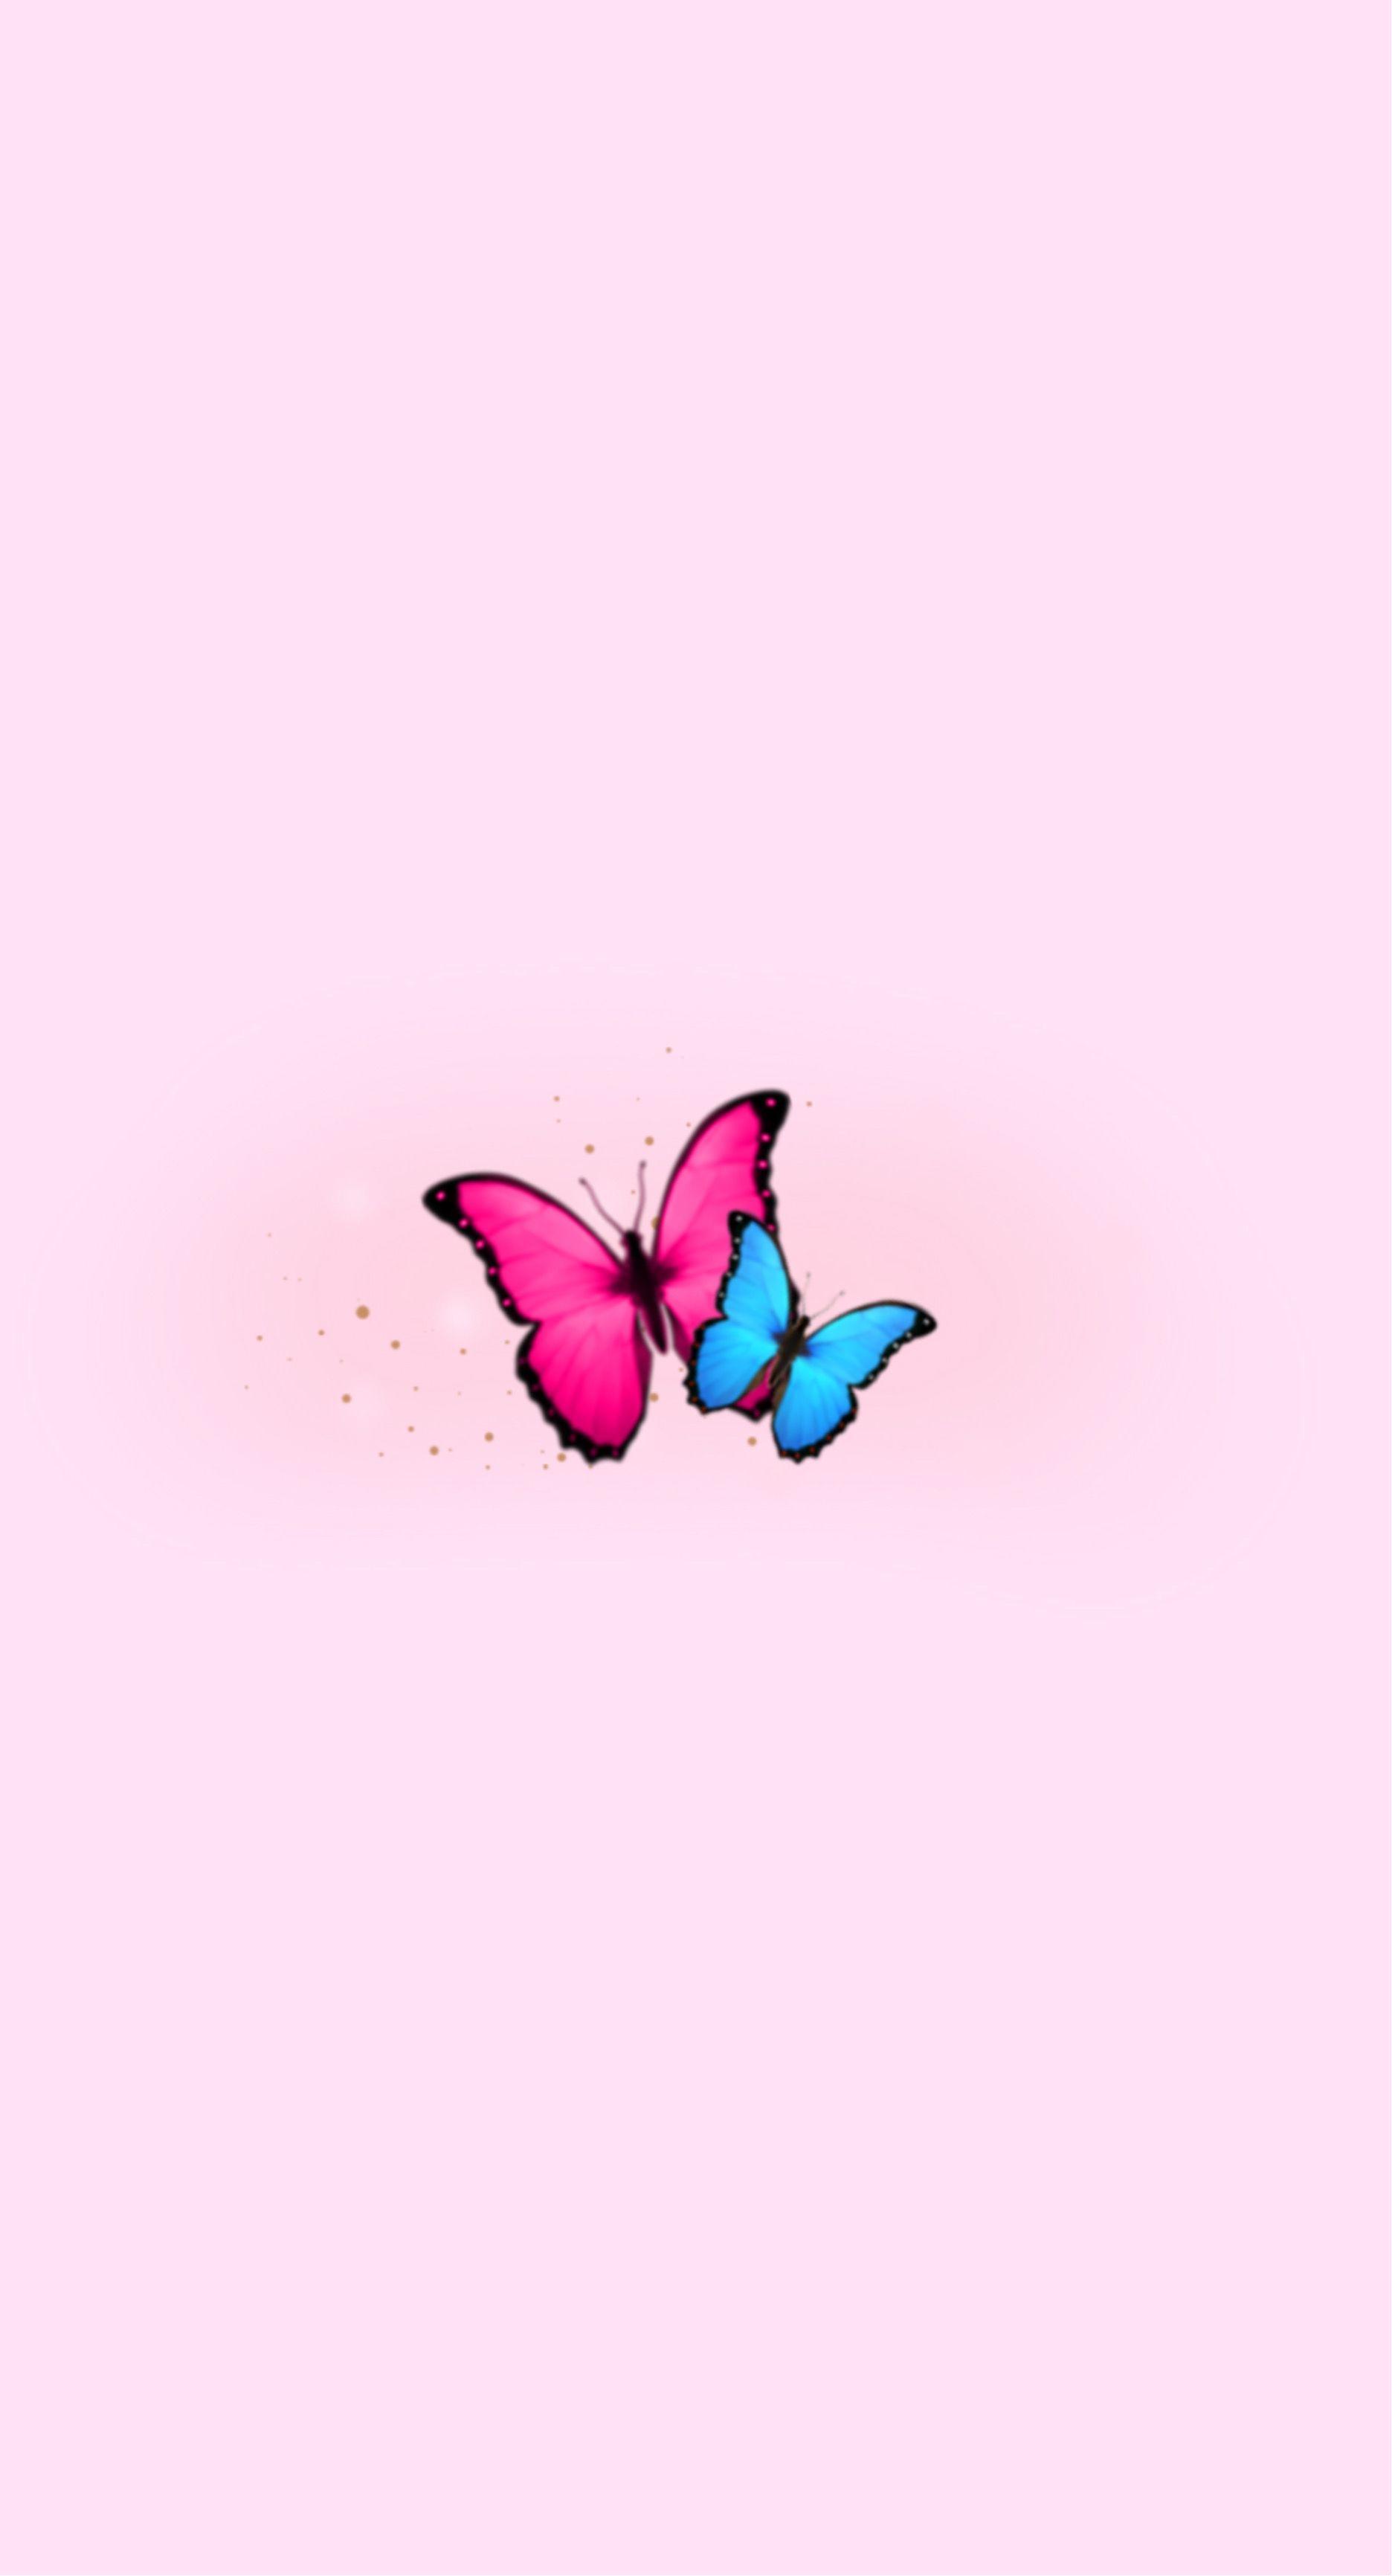 Pin By Sofia Gozzi On Wallpaper Pretty Wallpaper Iphone Butterfly Wallpaper Iphone Free Iphone Wallpaper